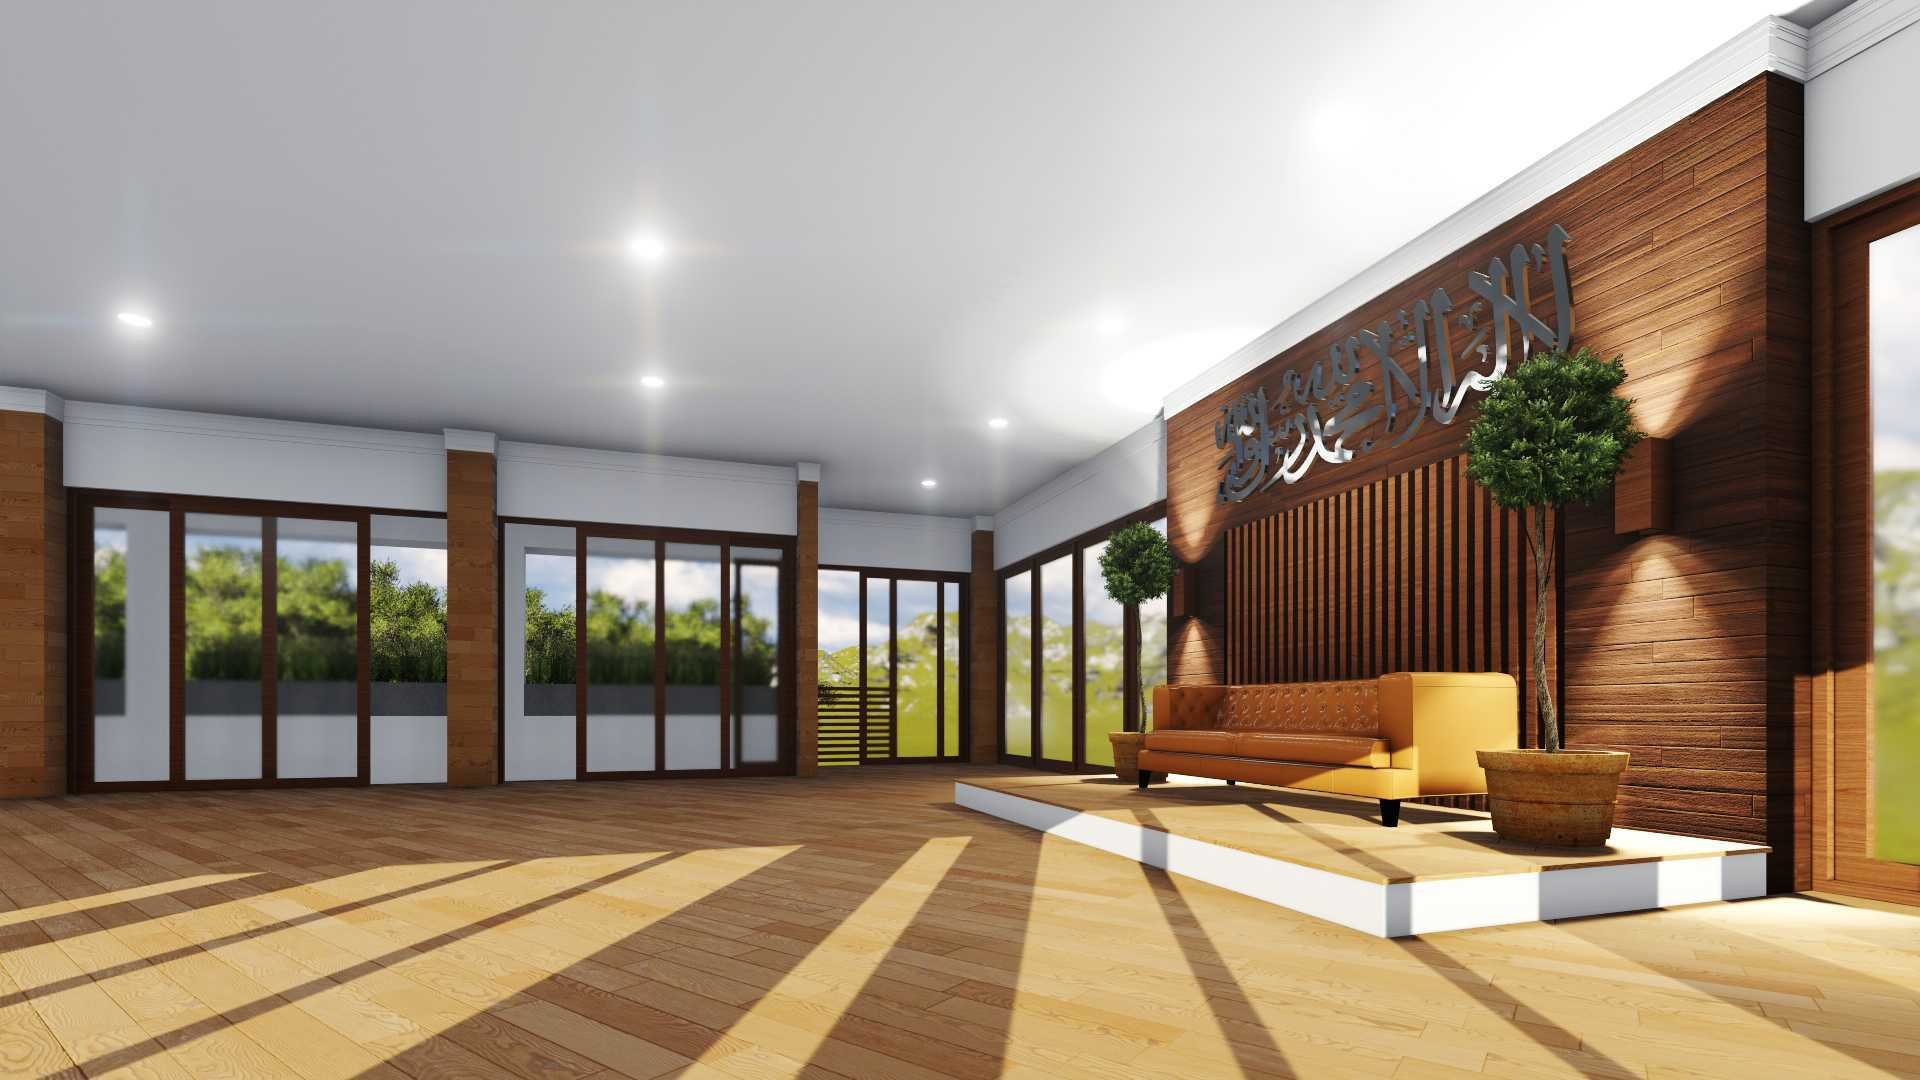 Mannor Architect Balai Pertemuan Megamendung Bogor, Jawa Barat, Indonesia Bogor, Jawa Barat, Indonesia Interior   40422